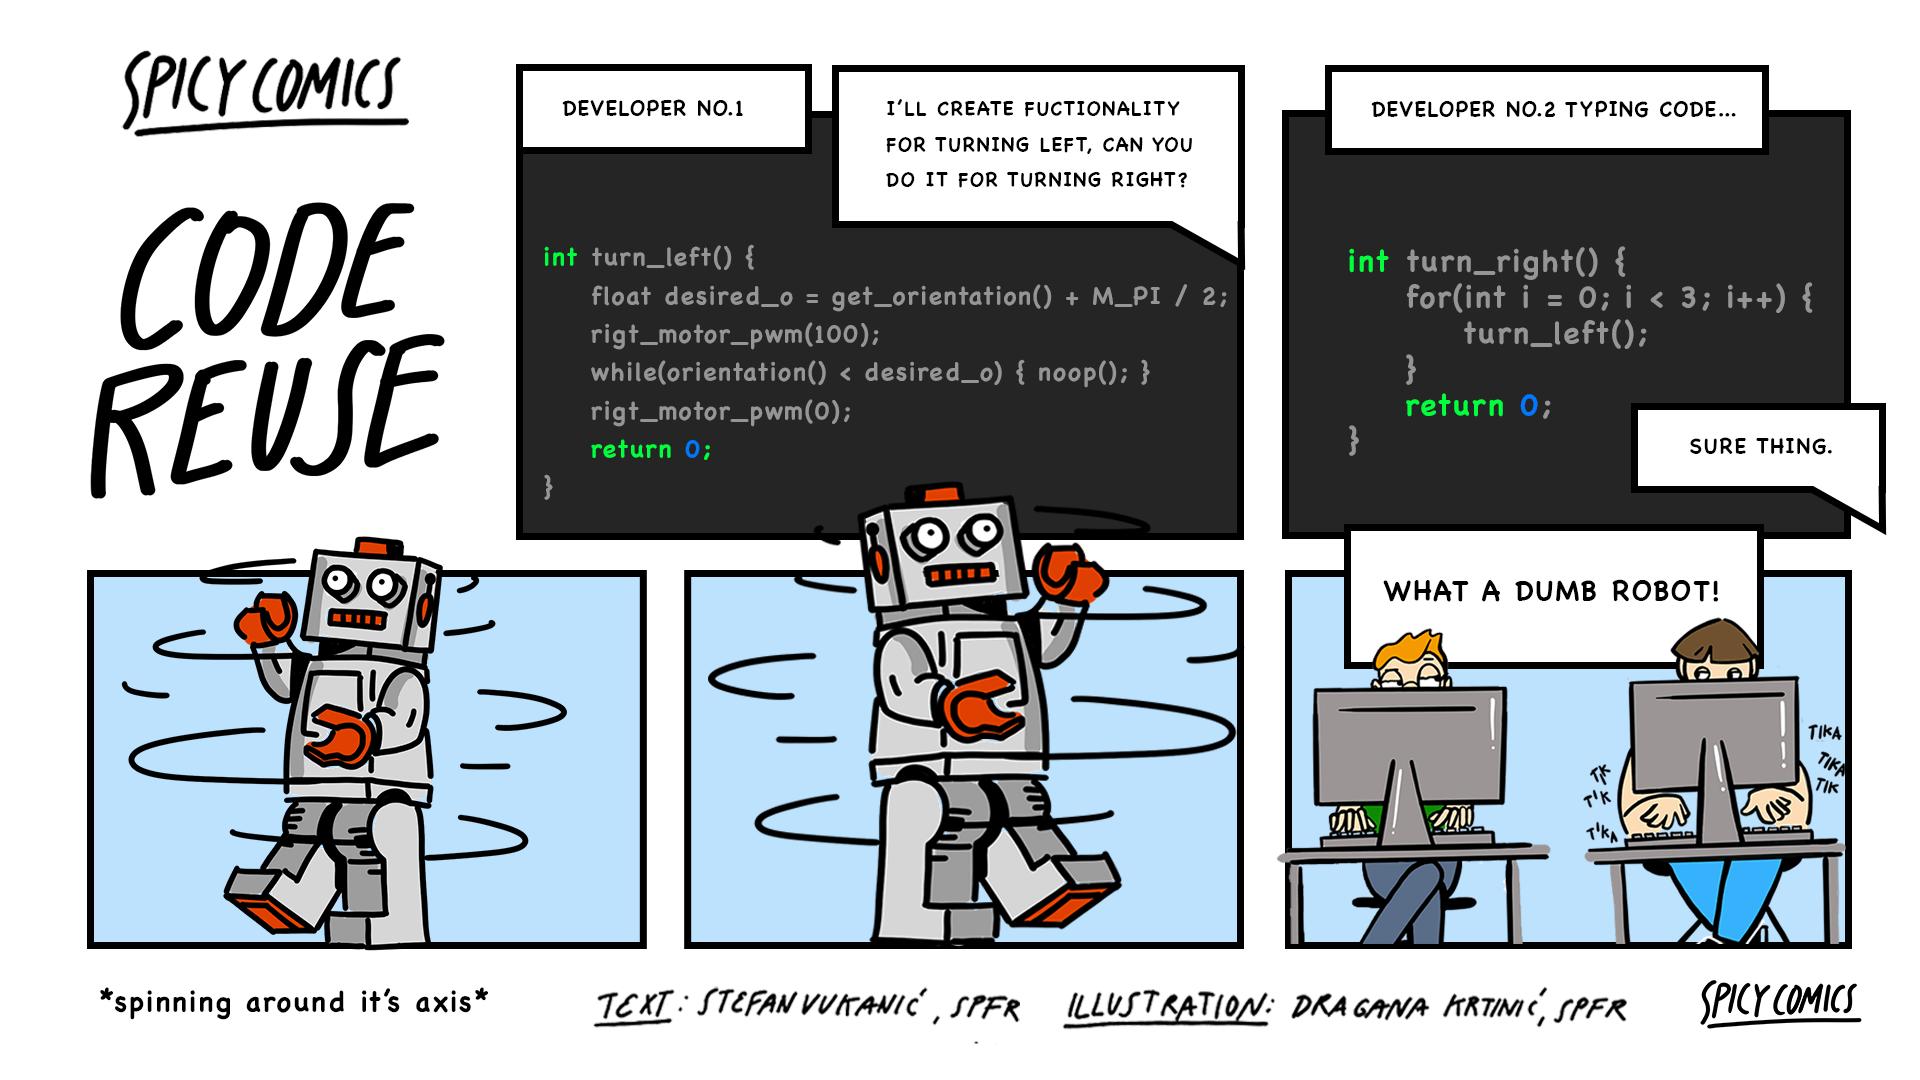 Spicy Comic #10 - Code Reuse